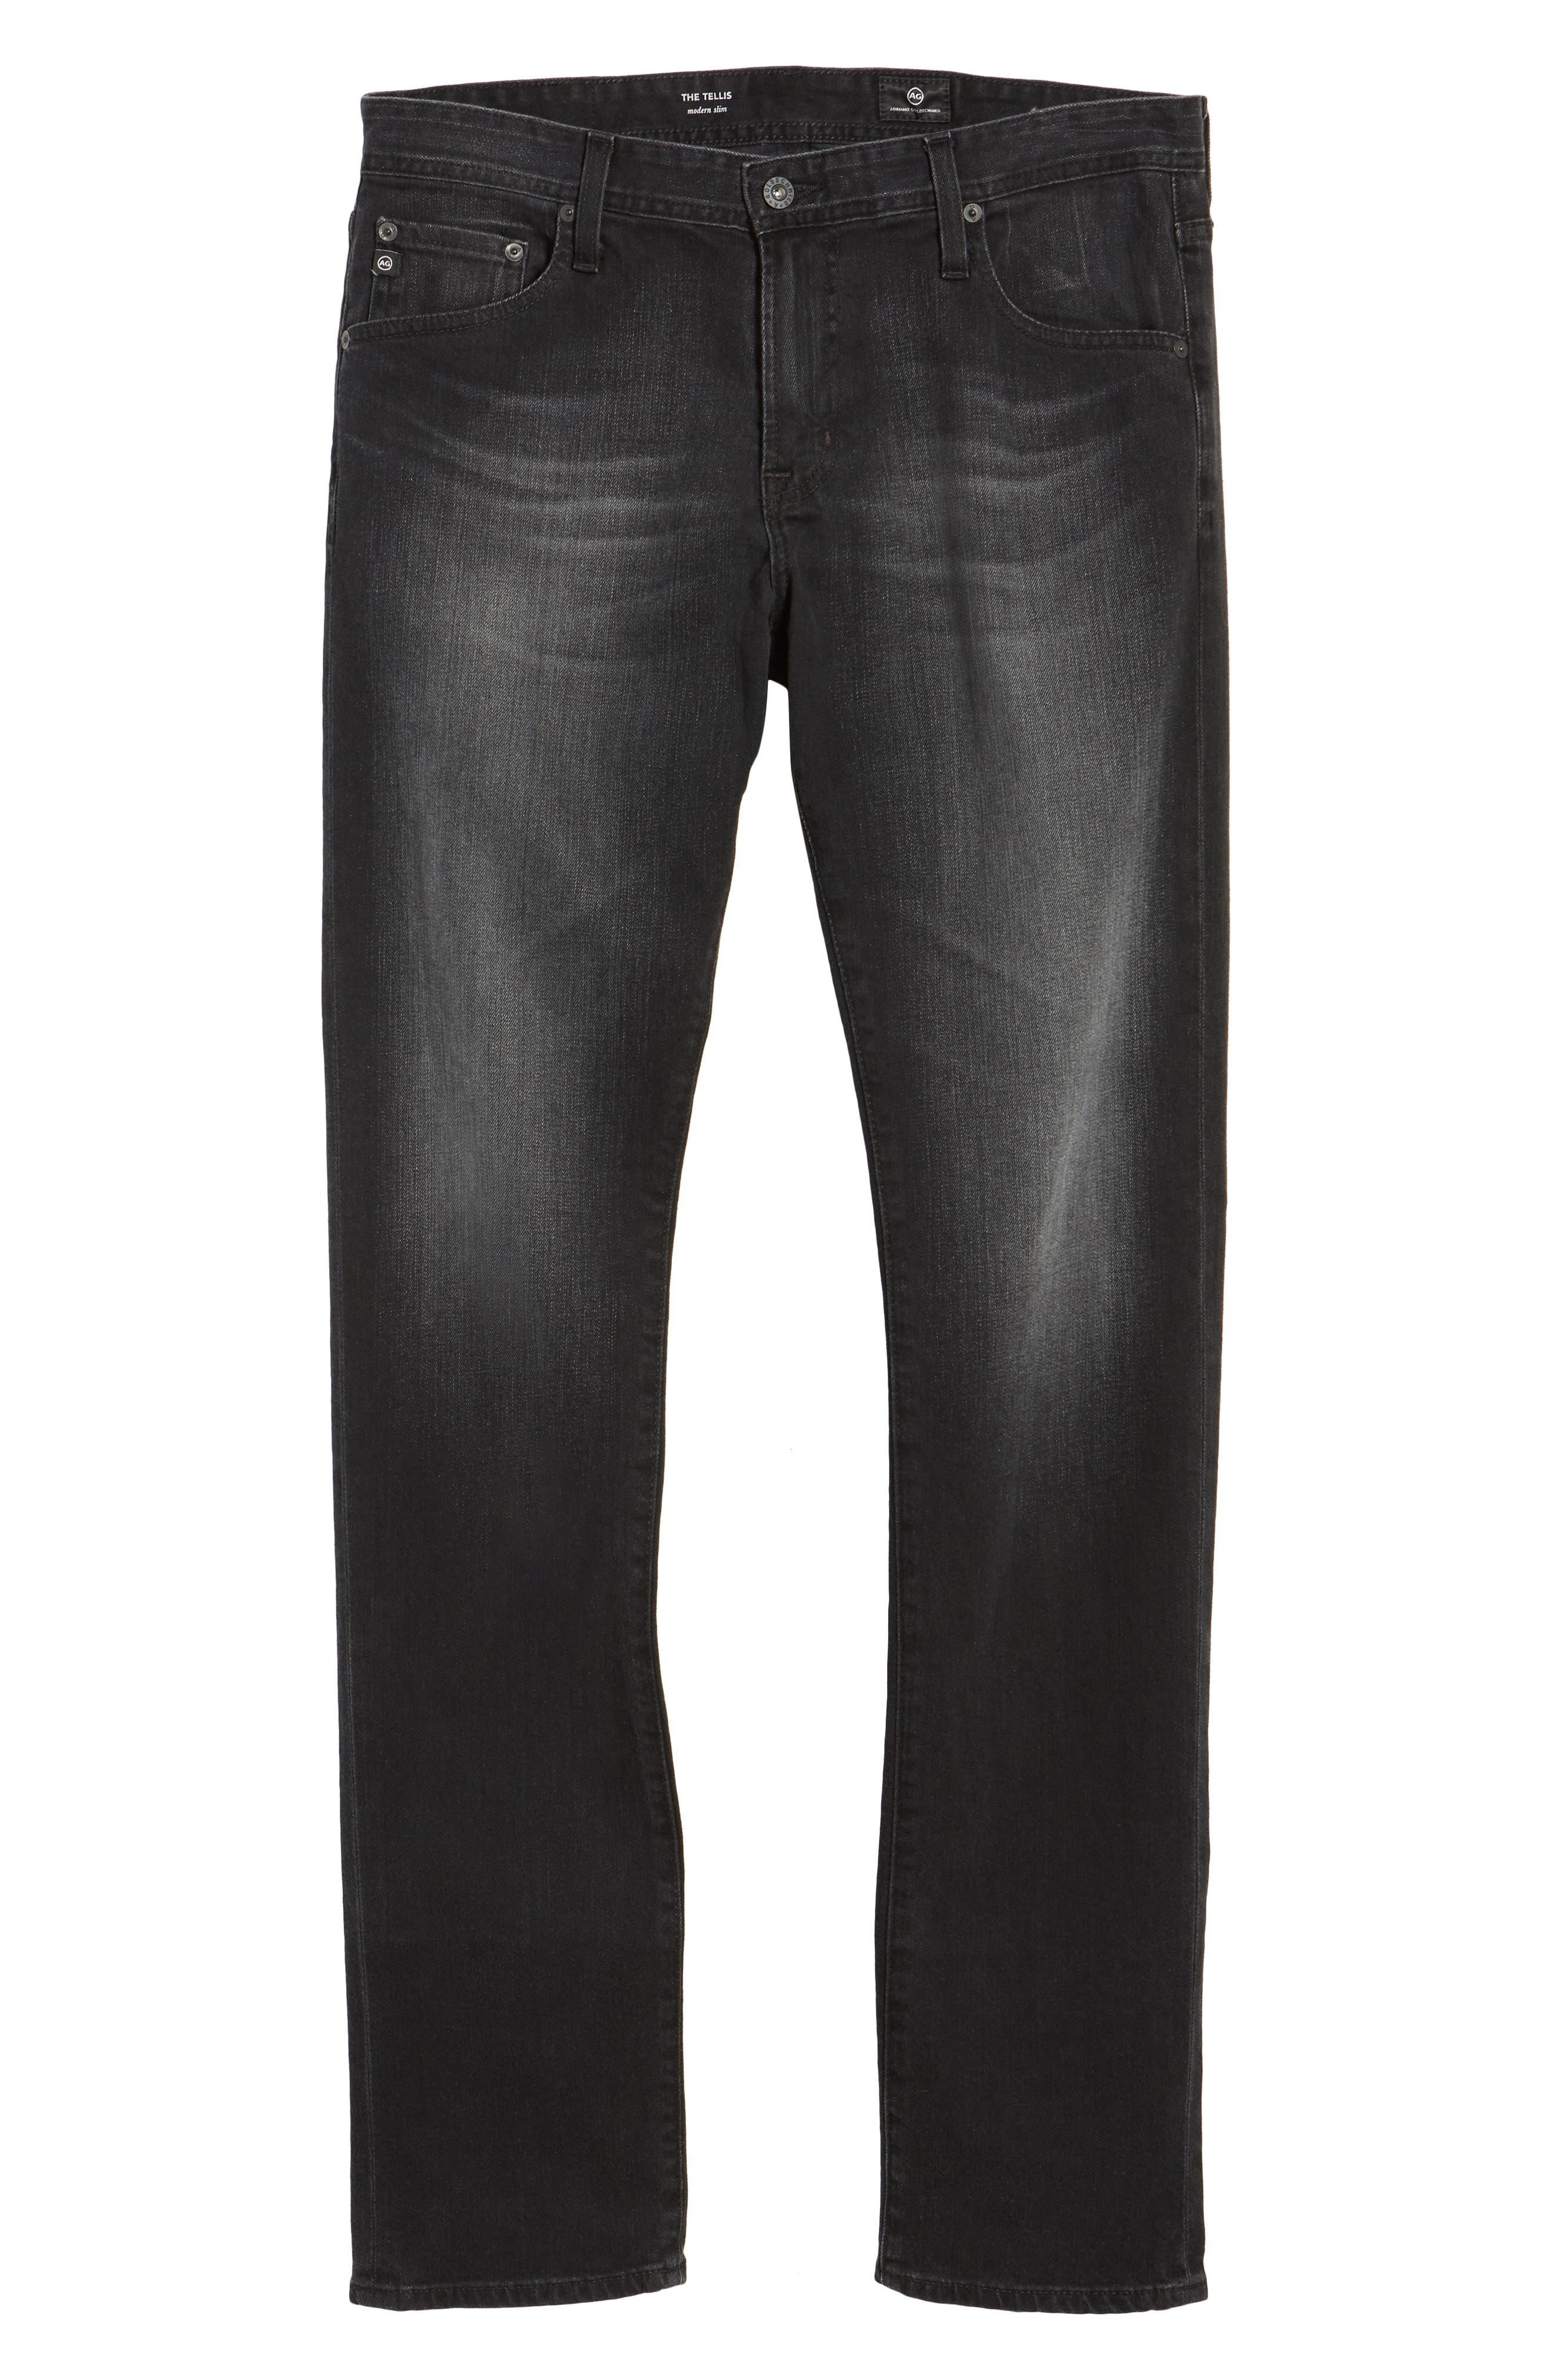 Tellis Modern Slim Fit Jeans,                             Alternate thumbnail 6, color,                             Smudged Black